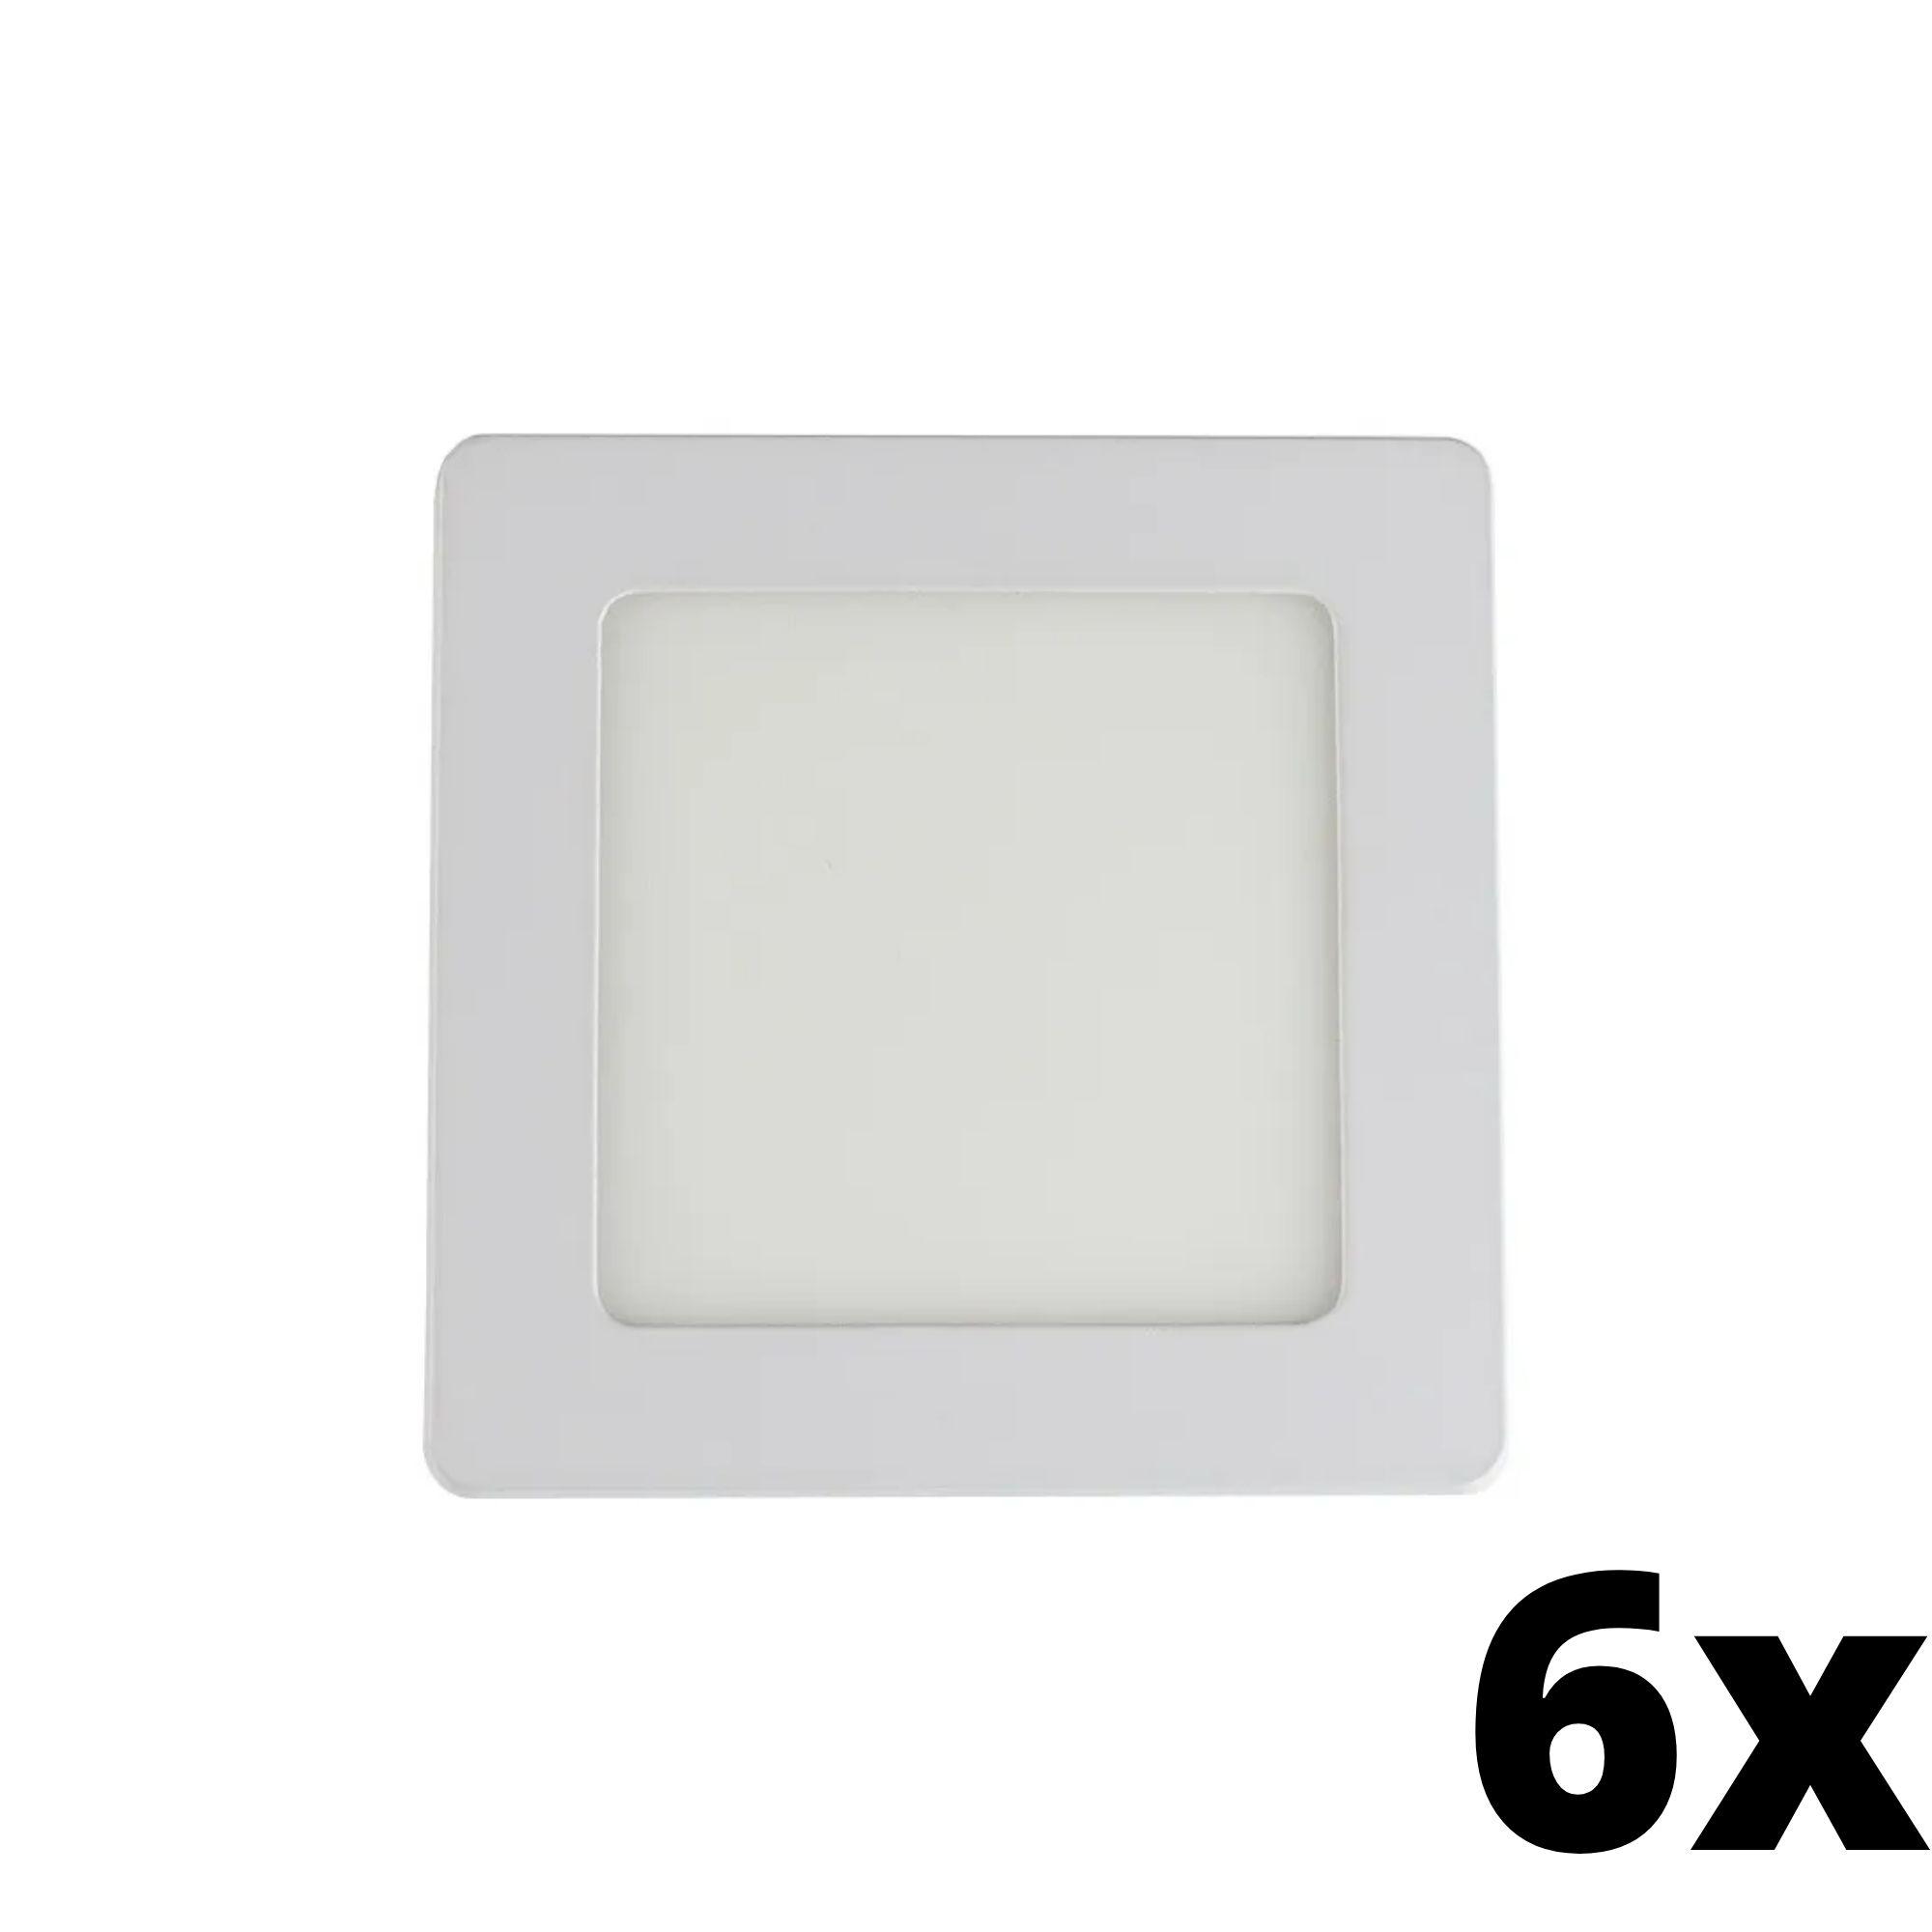 Kit 6 und Painel de Led Embutir 6w Quadrado 3000k